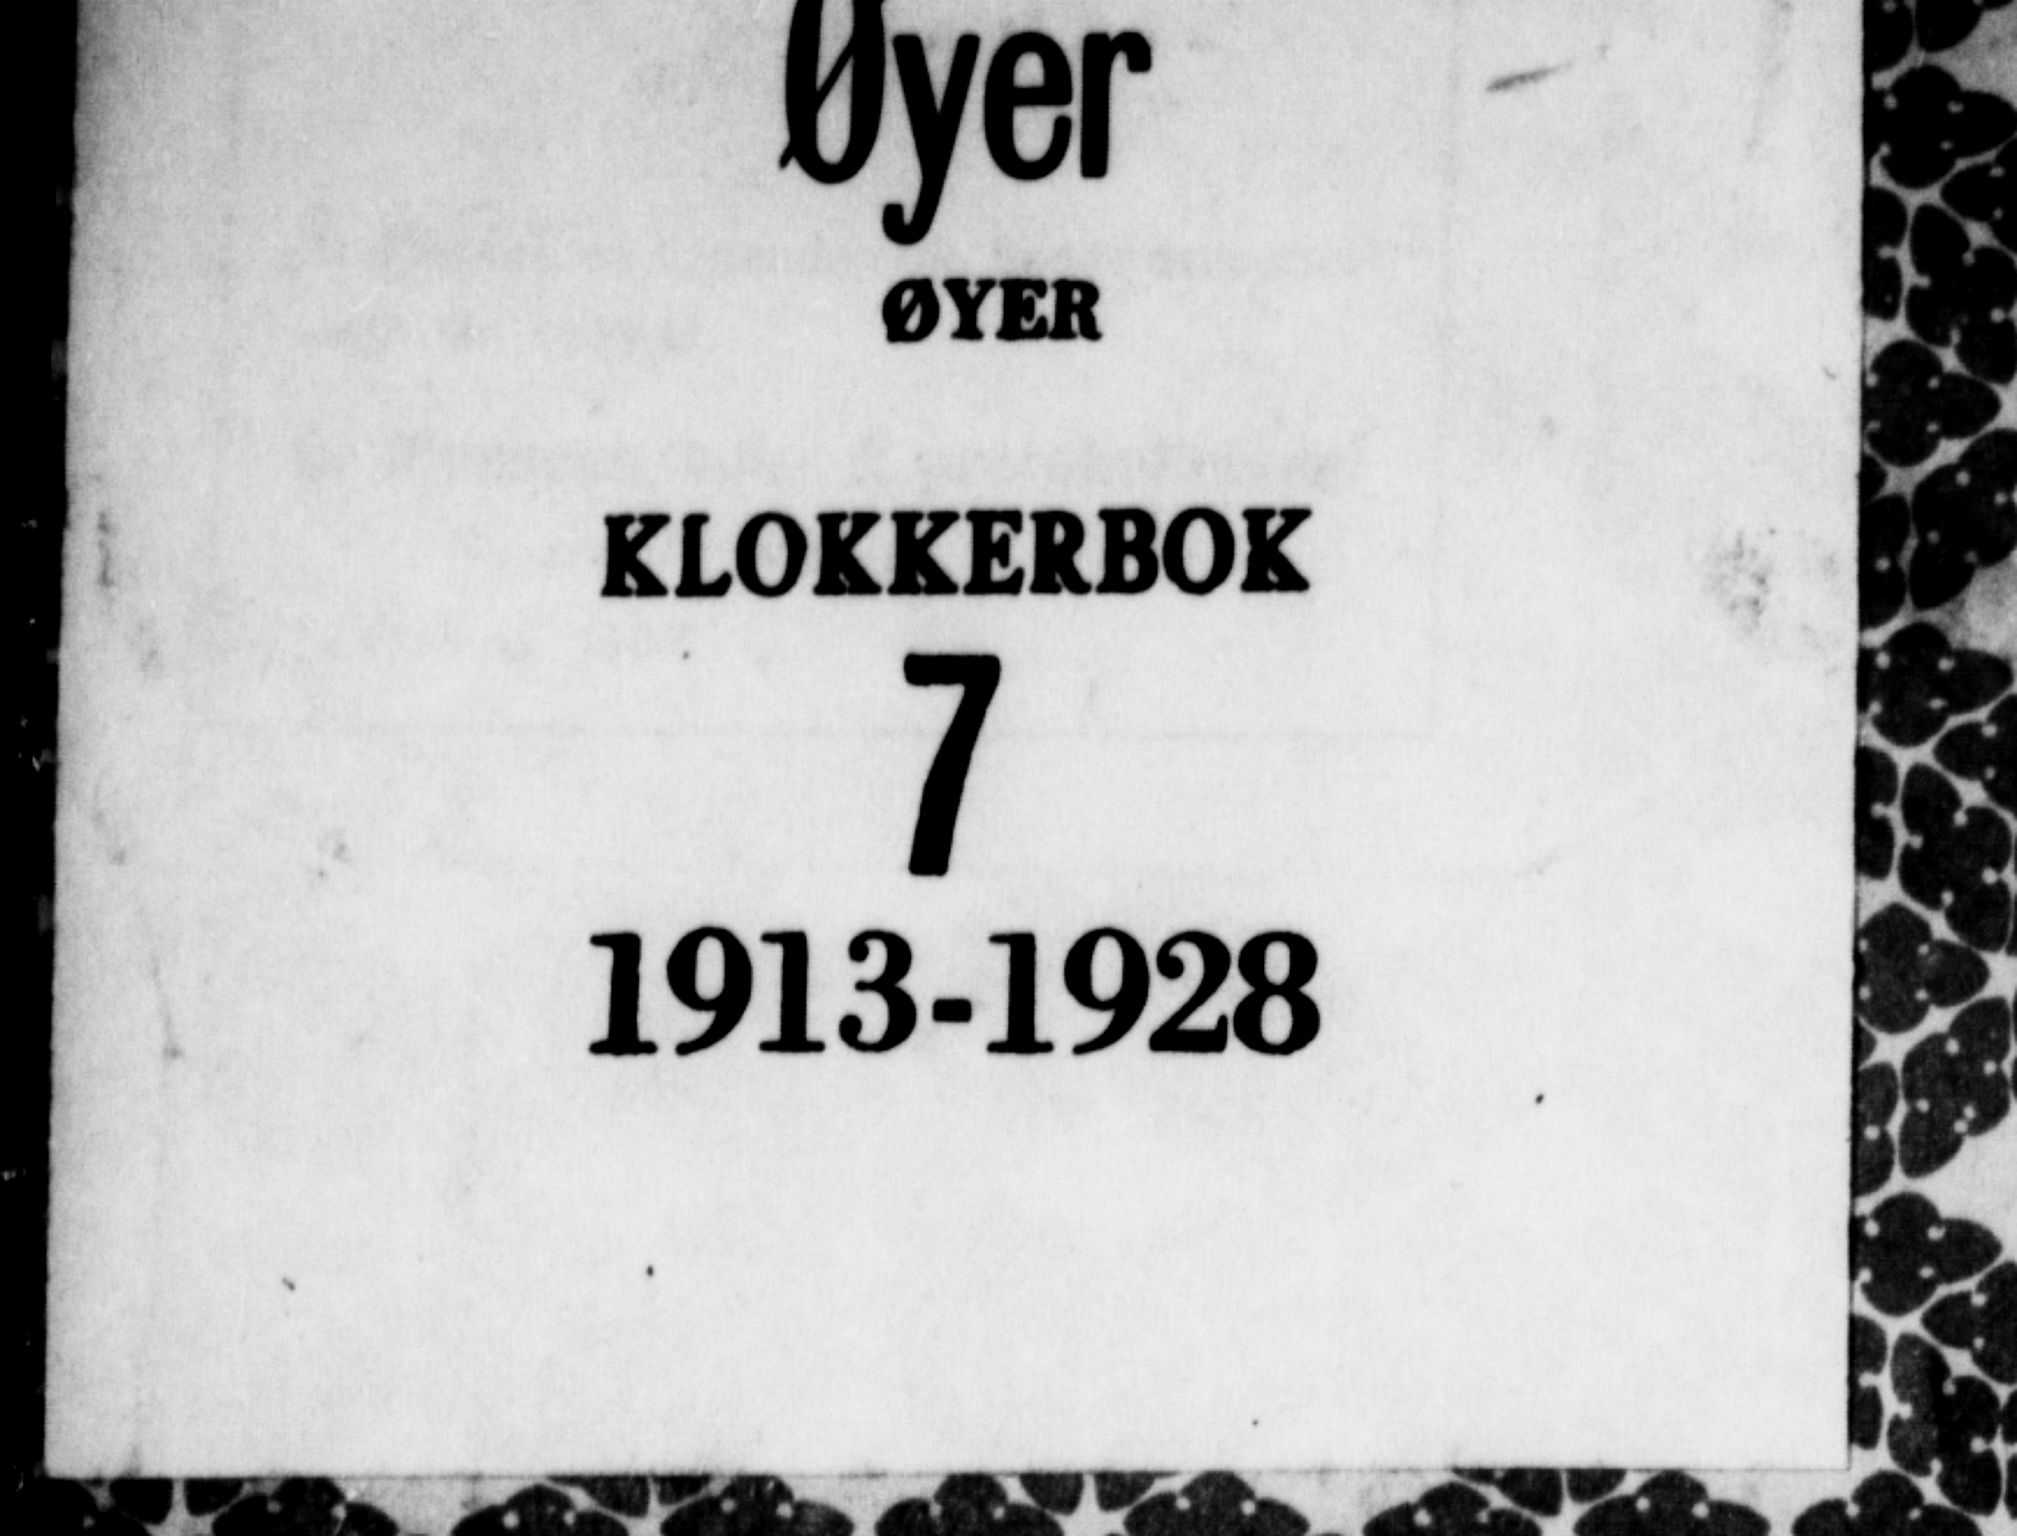 SAH, Øyer prestekontor, Klokkerbok nr. 7, 1913-1928